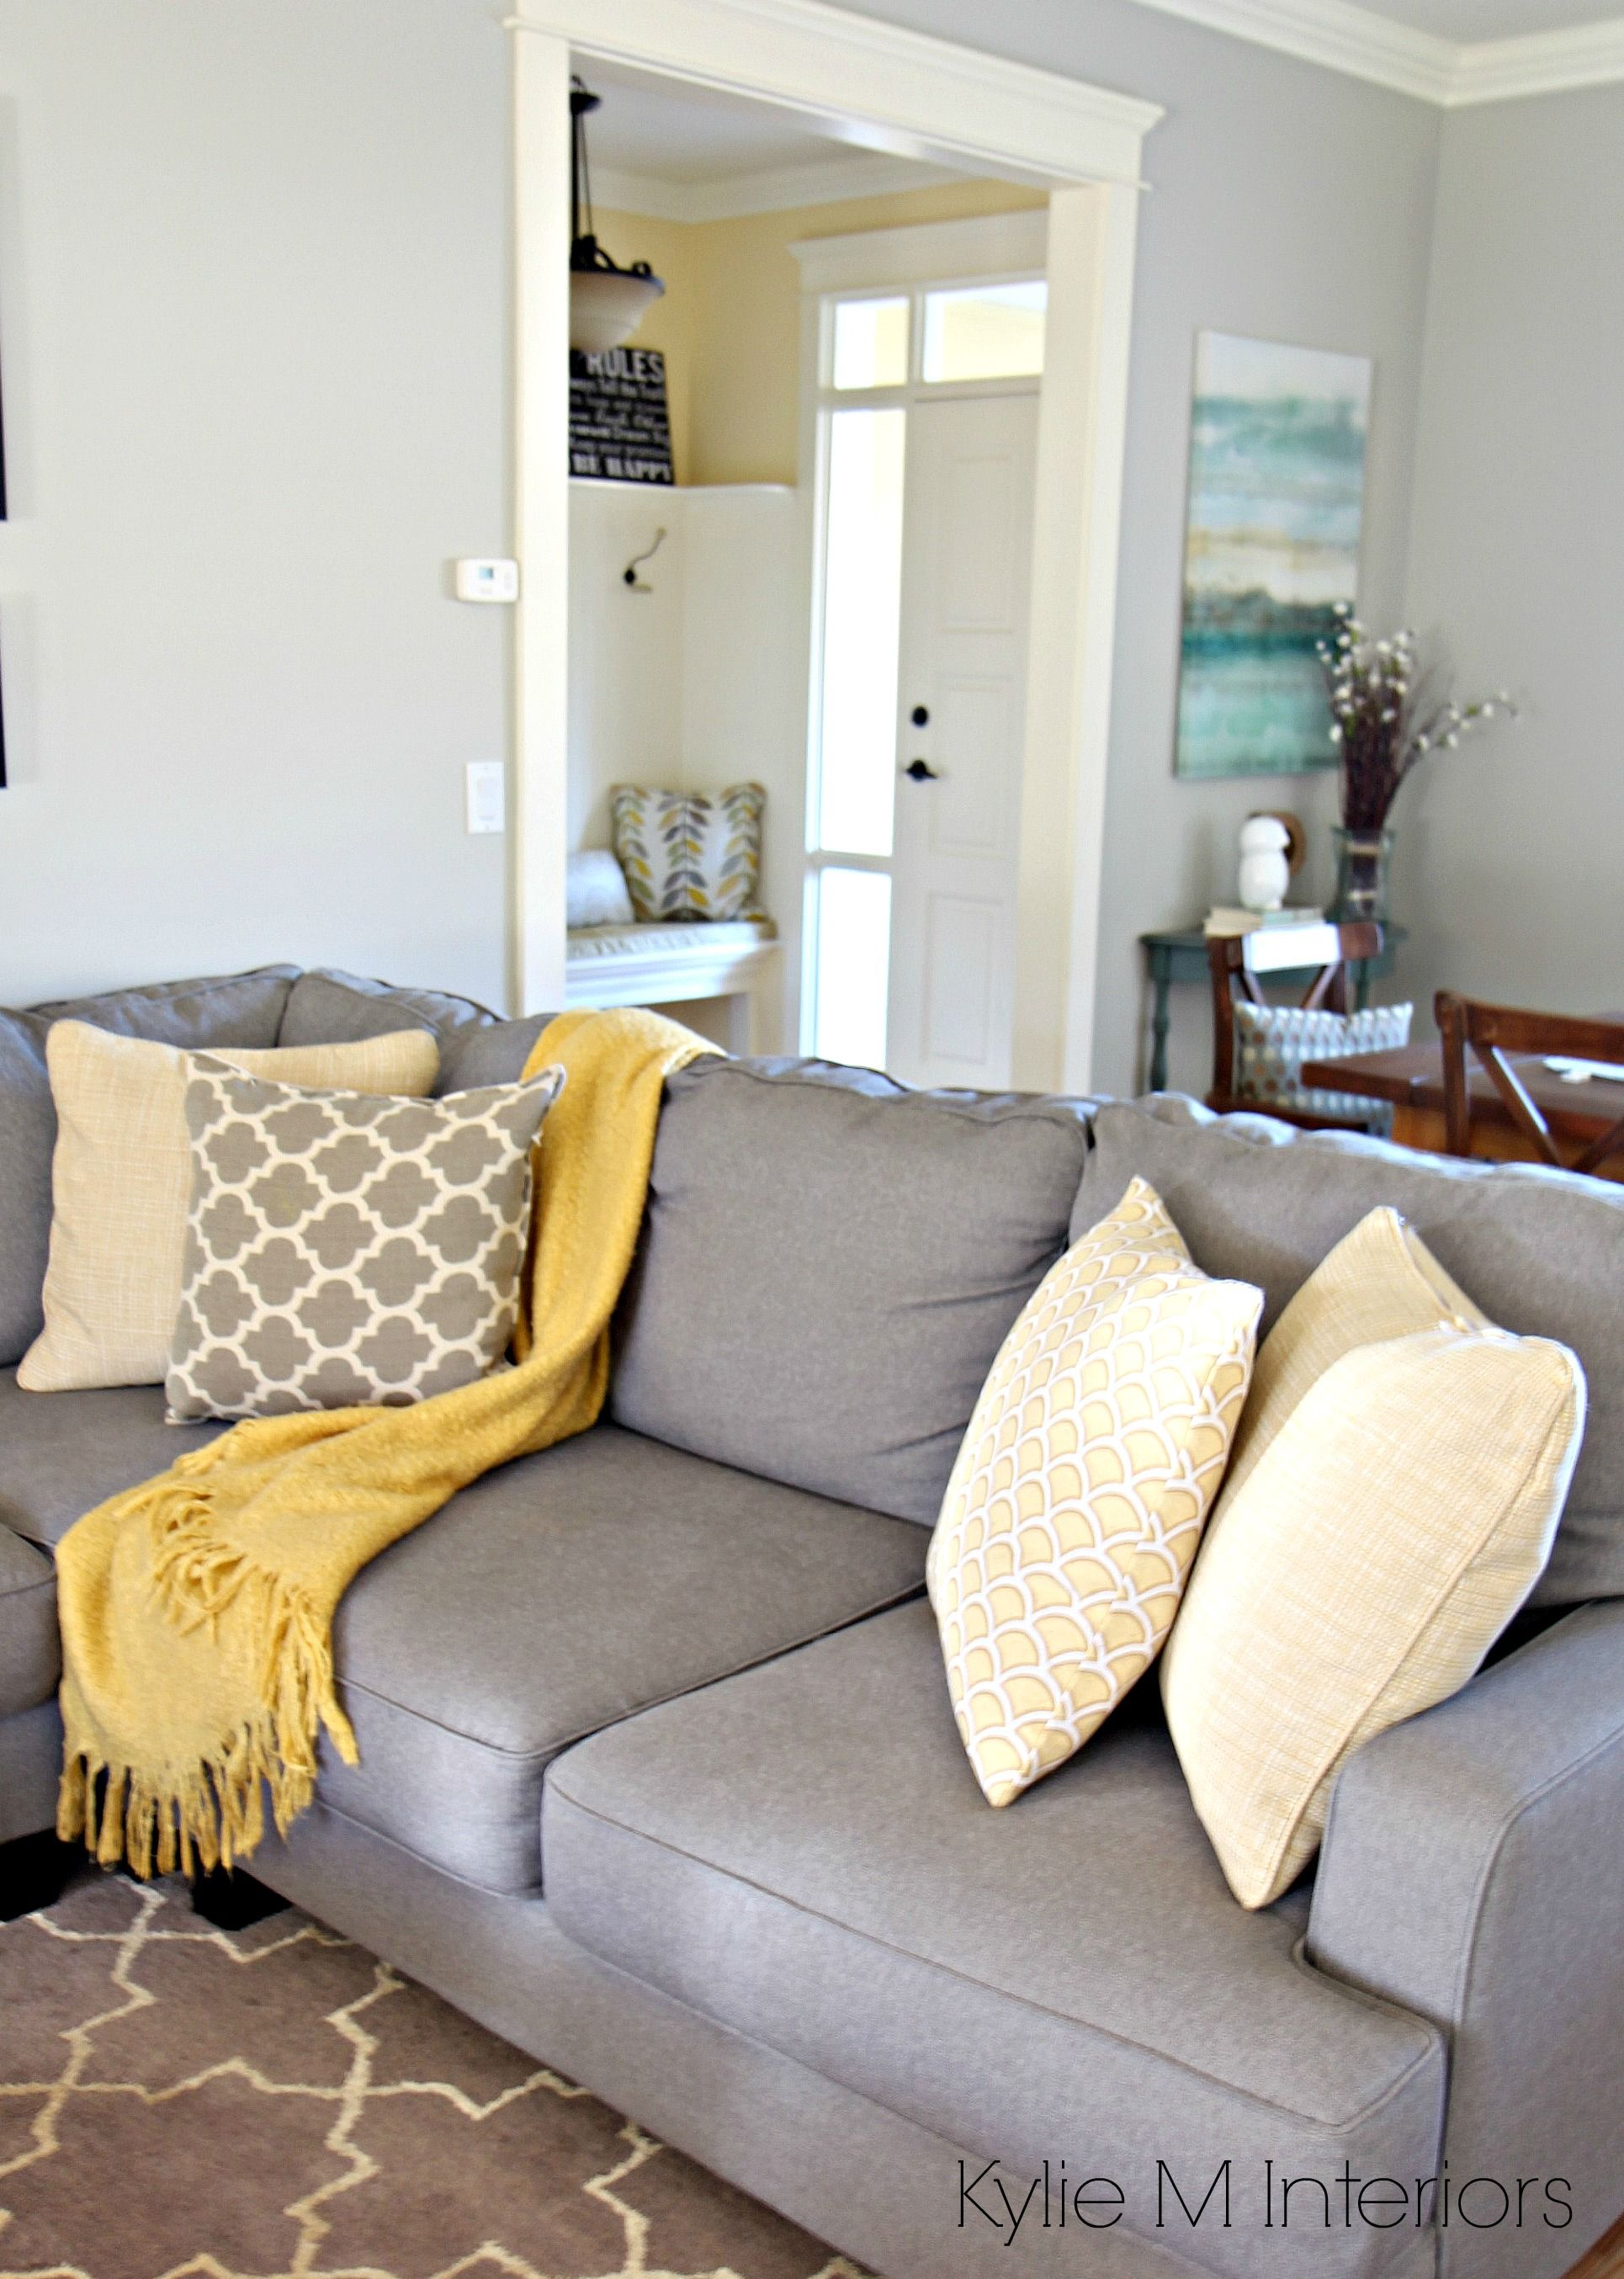 Needy Home Lavish It With Home Improvement Ideas Yellow Decor